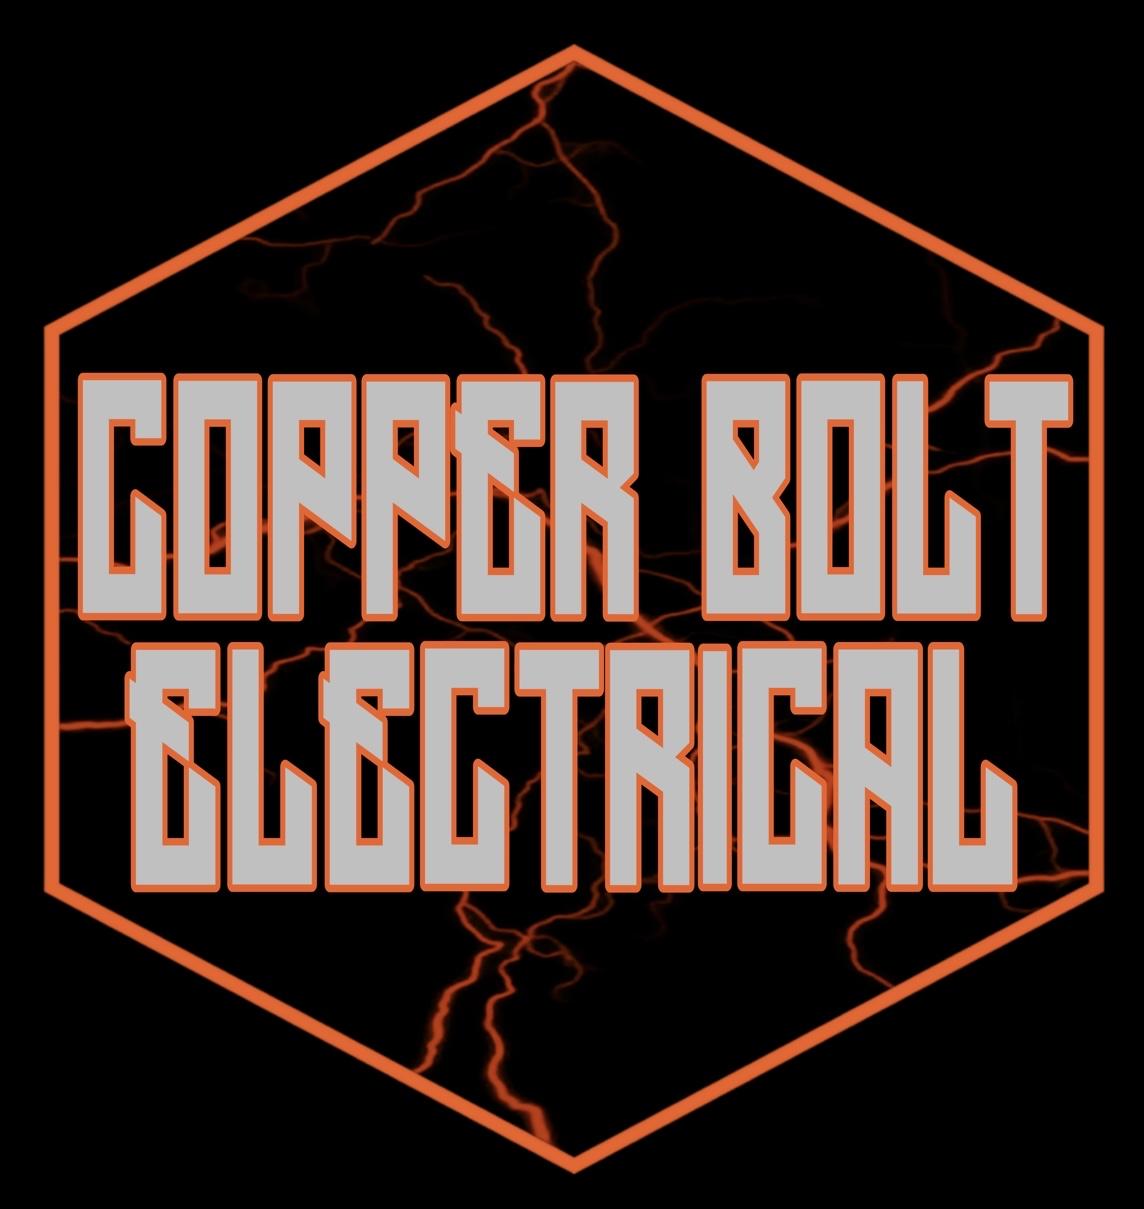 Copper Bolt Electrical Verified Logo